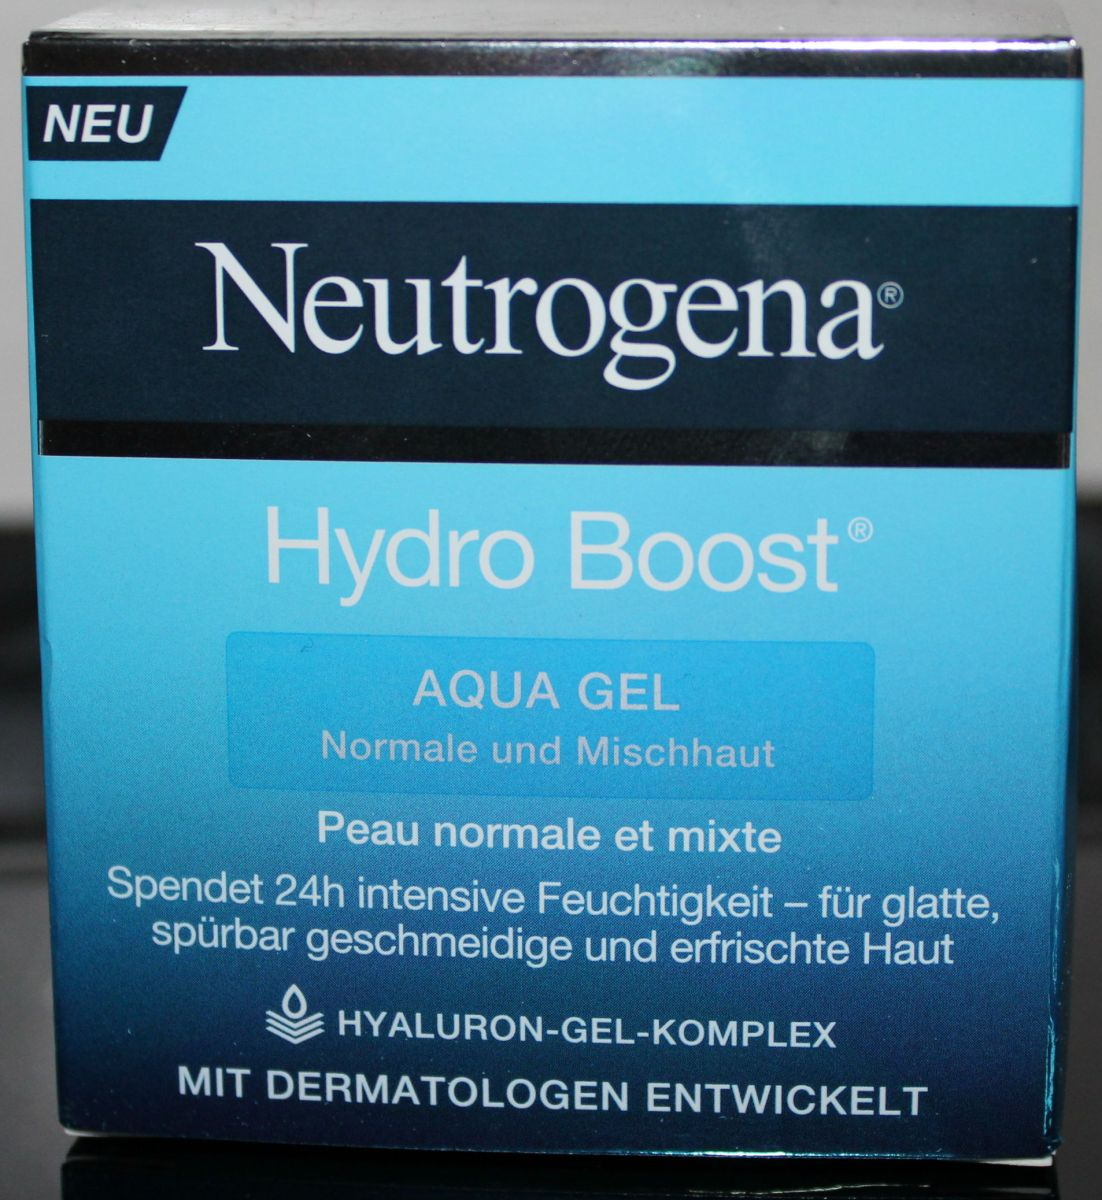 Getestet NEUTROGENA Hydro Boost Aqua Gel